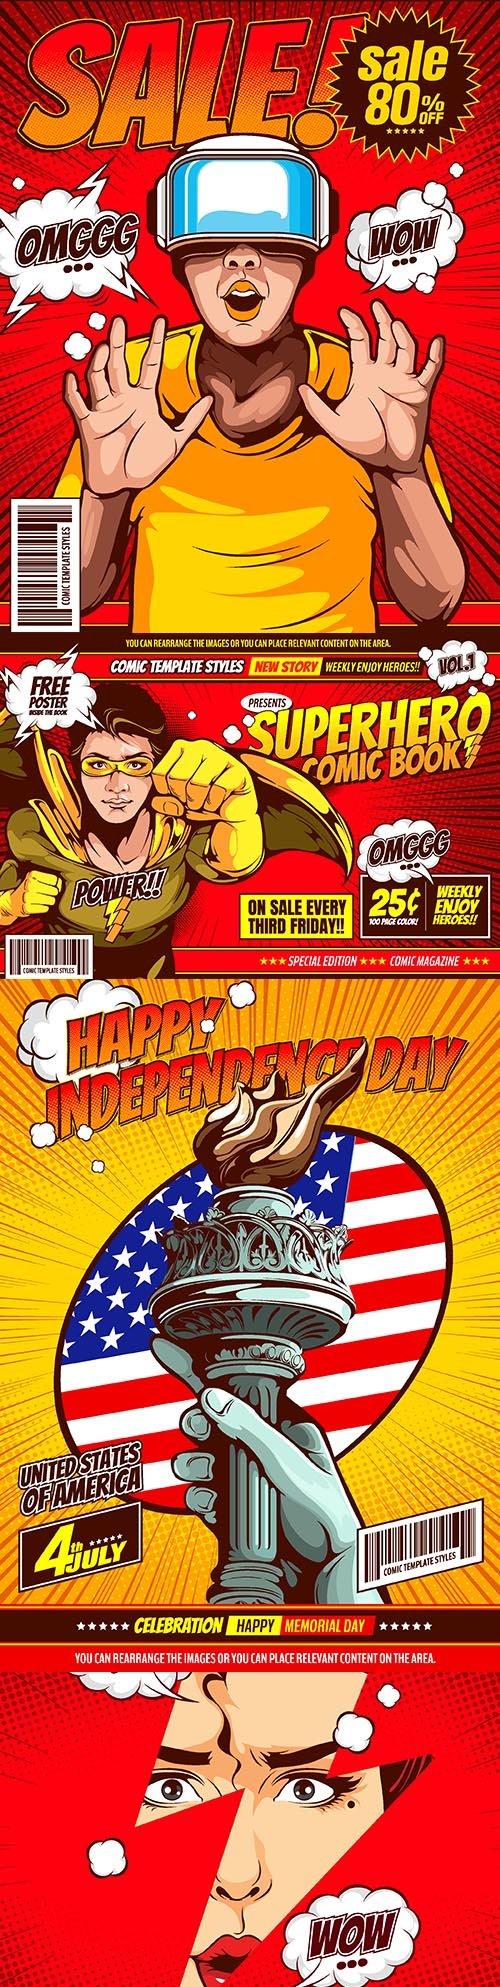 Superhero comic book covers pop art design